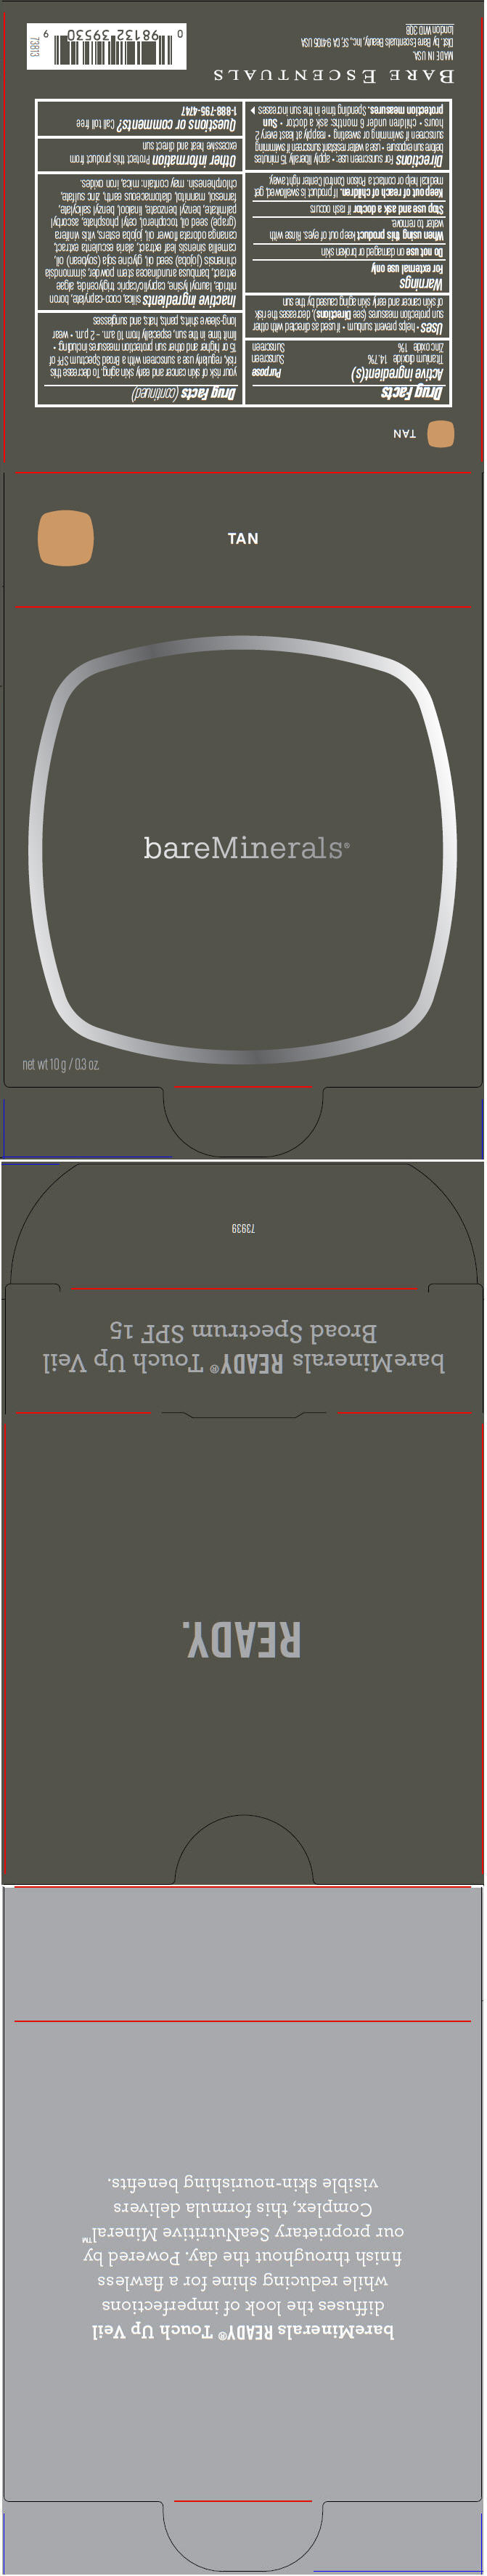 Principal Display Panel - 10 g Tray Carton - Tan